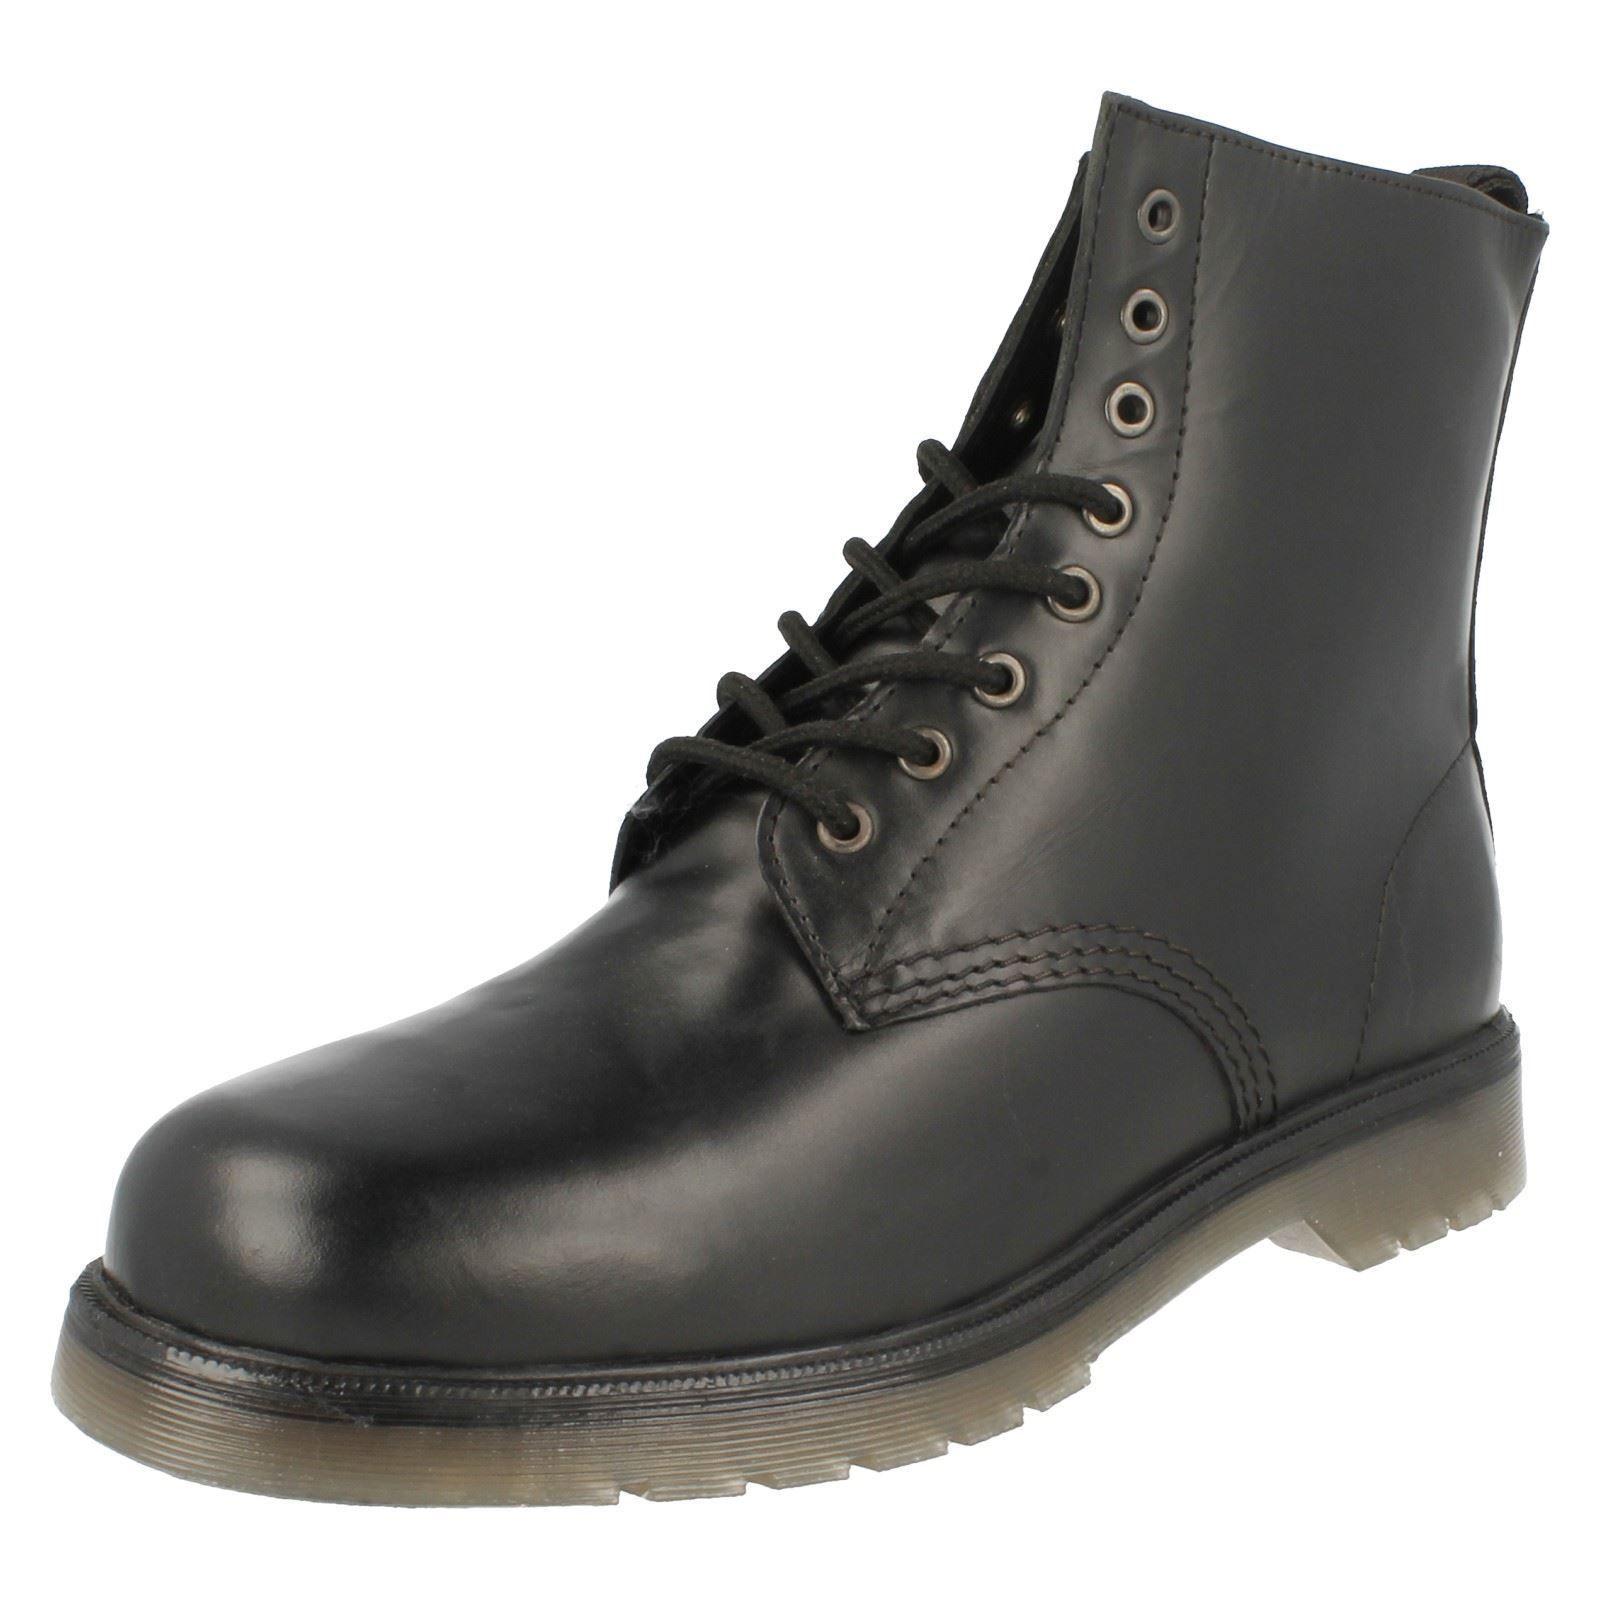 Maverick 1900 Mens Leather Lace uo Boots